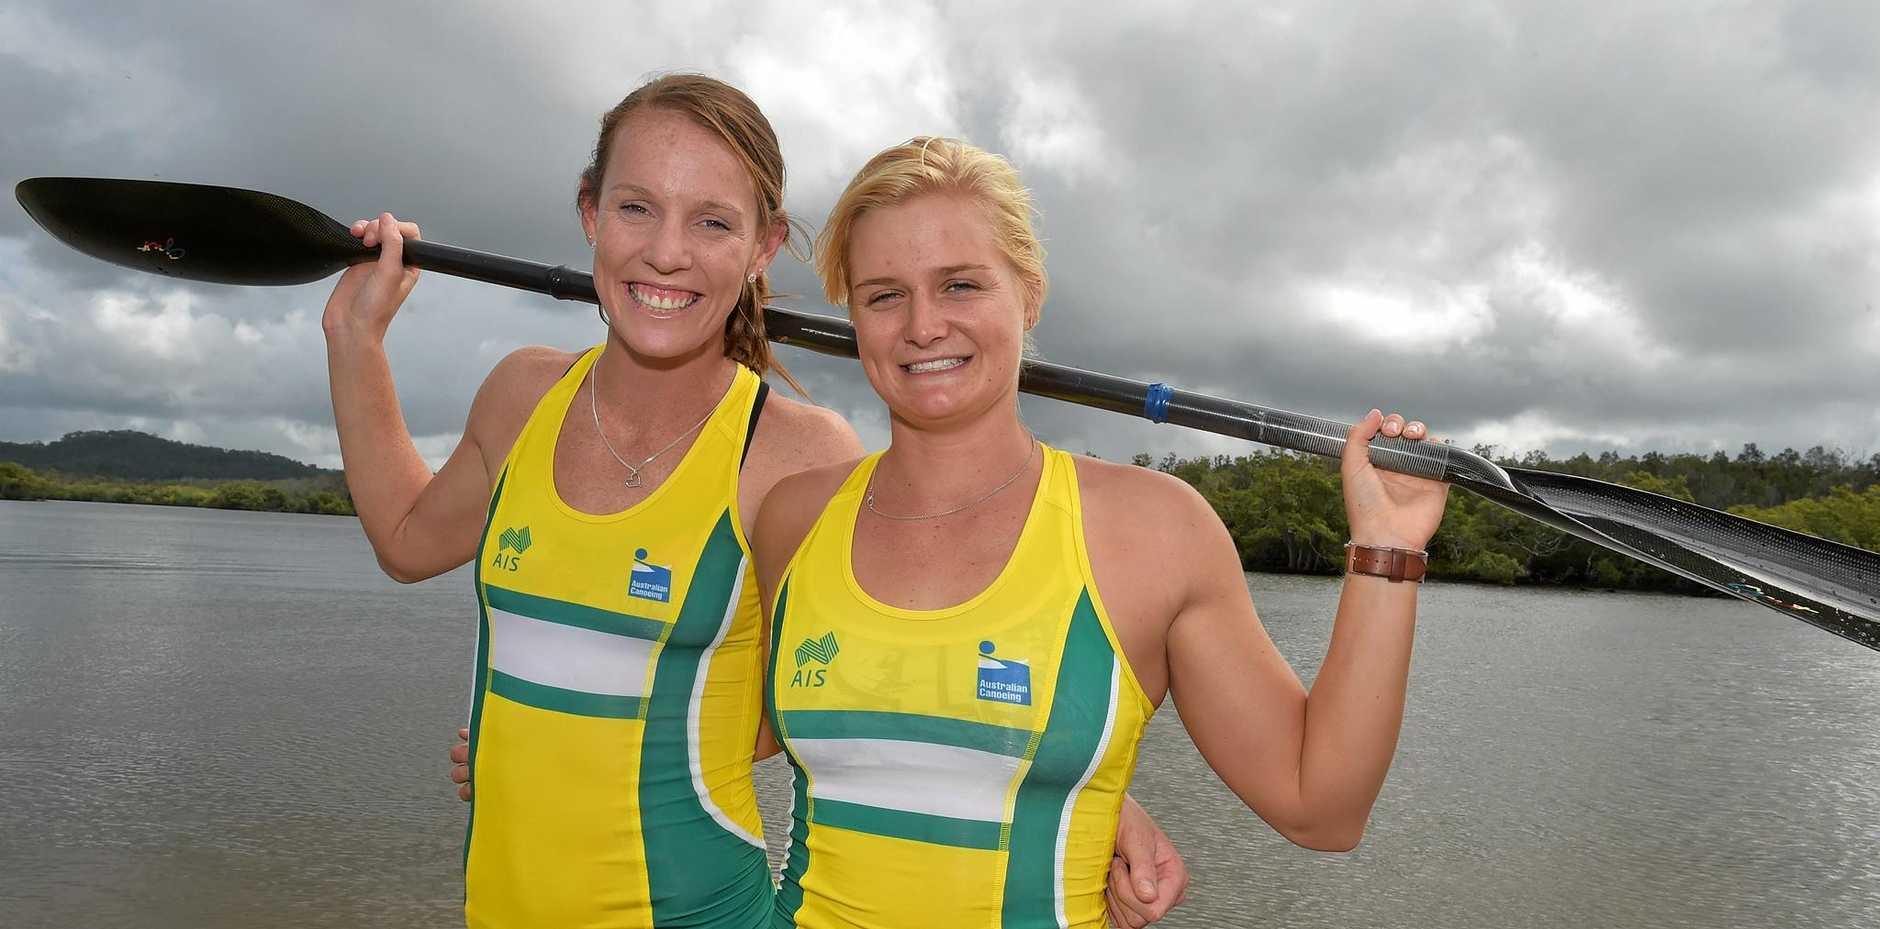 Alyce Burnett and Alyssa Bull are set for the Olympics as part of the kayak team. Photo: Warren Lynam / Sunshine Coast Daily